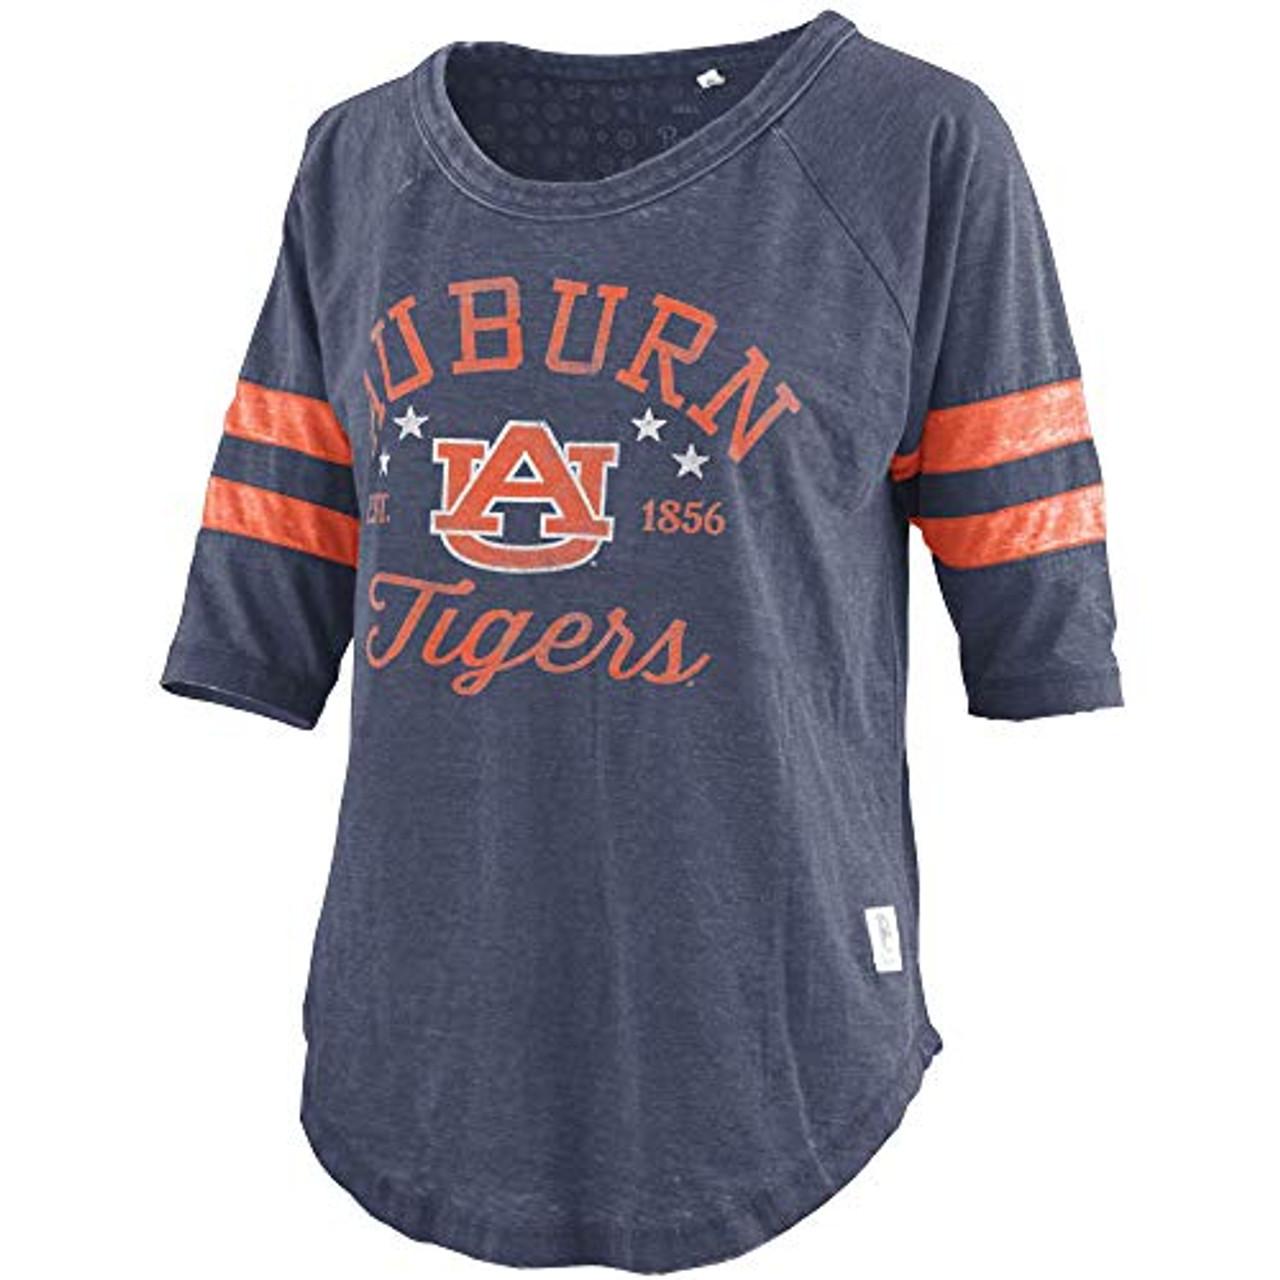 on sale d911c 7cfb0 Pressbox NCAA Womens Auburn Tigers Jade Jersey Raglan Striped 3/4 Sleeve  Shirt